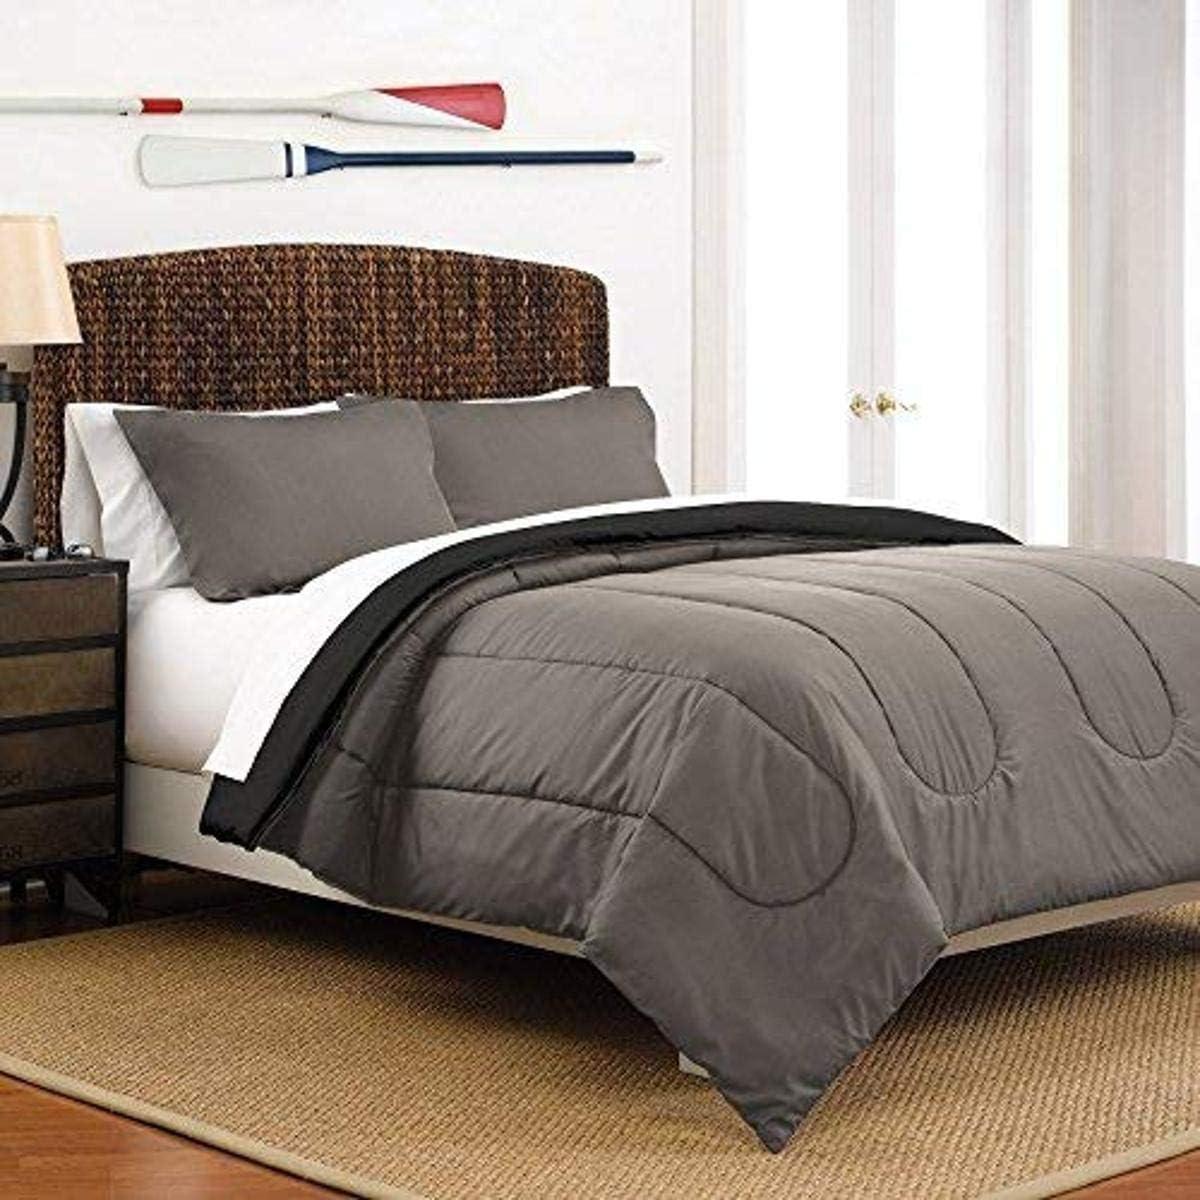 Martex Reversible Comforter Gorgeous Set Genuine Free Shipping Ebony Twin Graphite